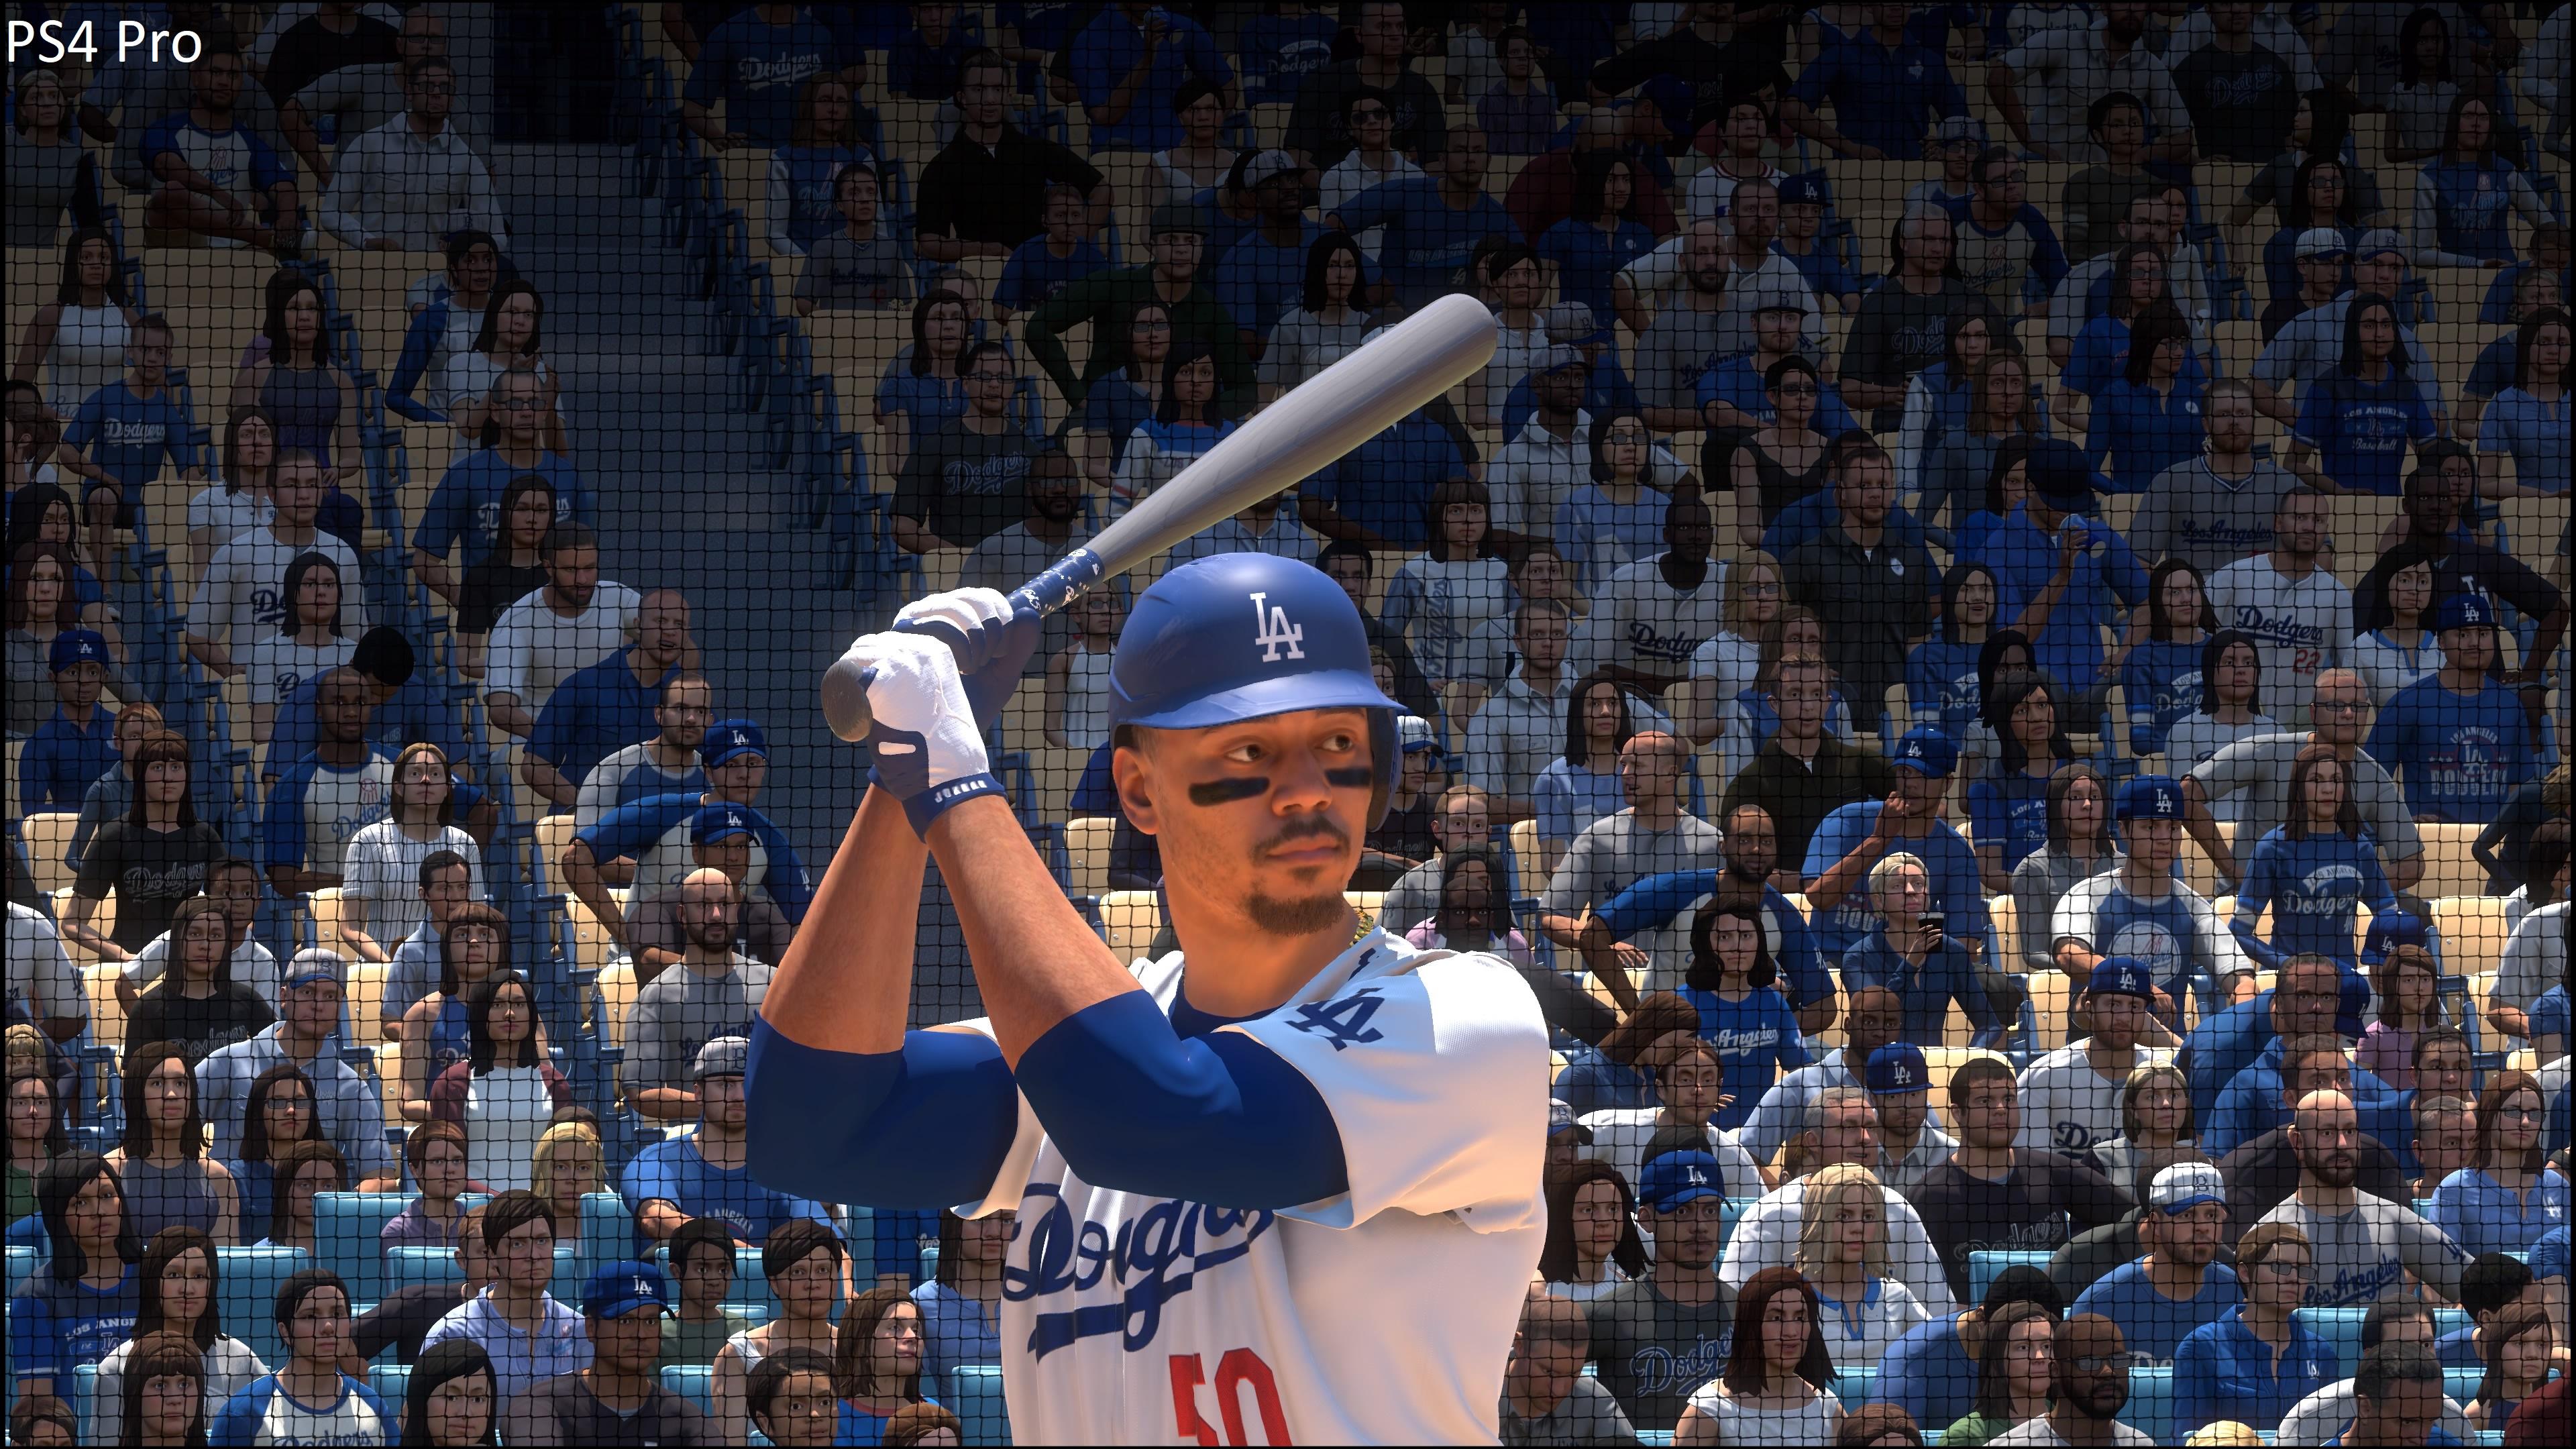 PS4 Pro MLB(R) The Show(TM) 21